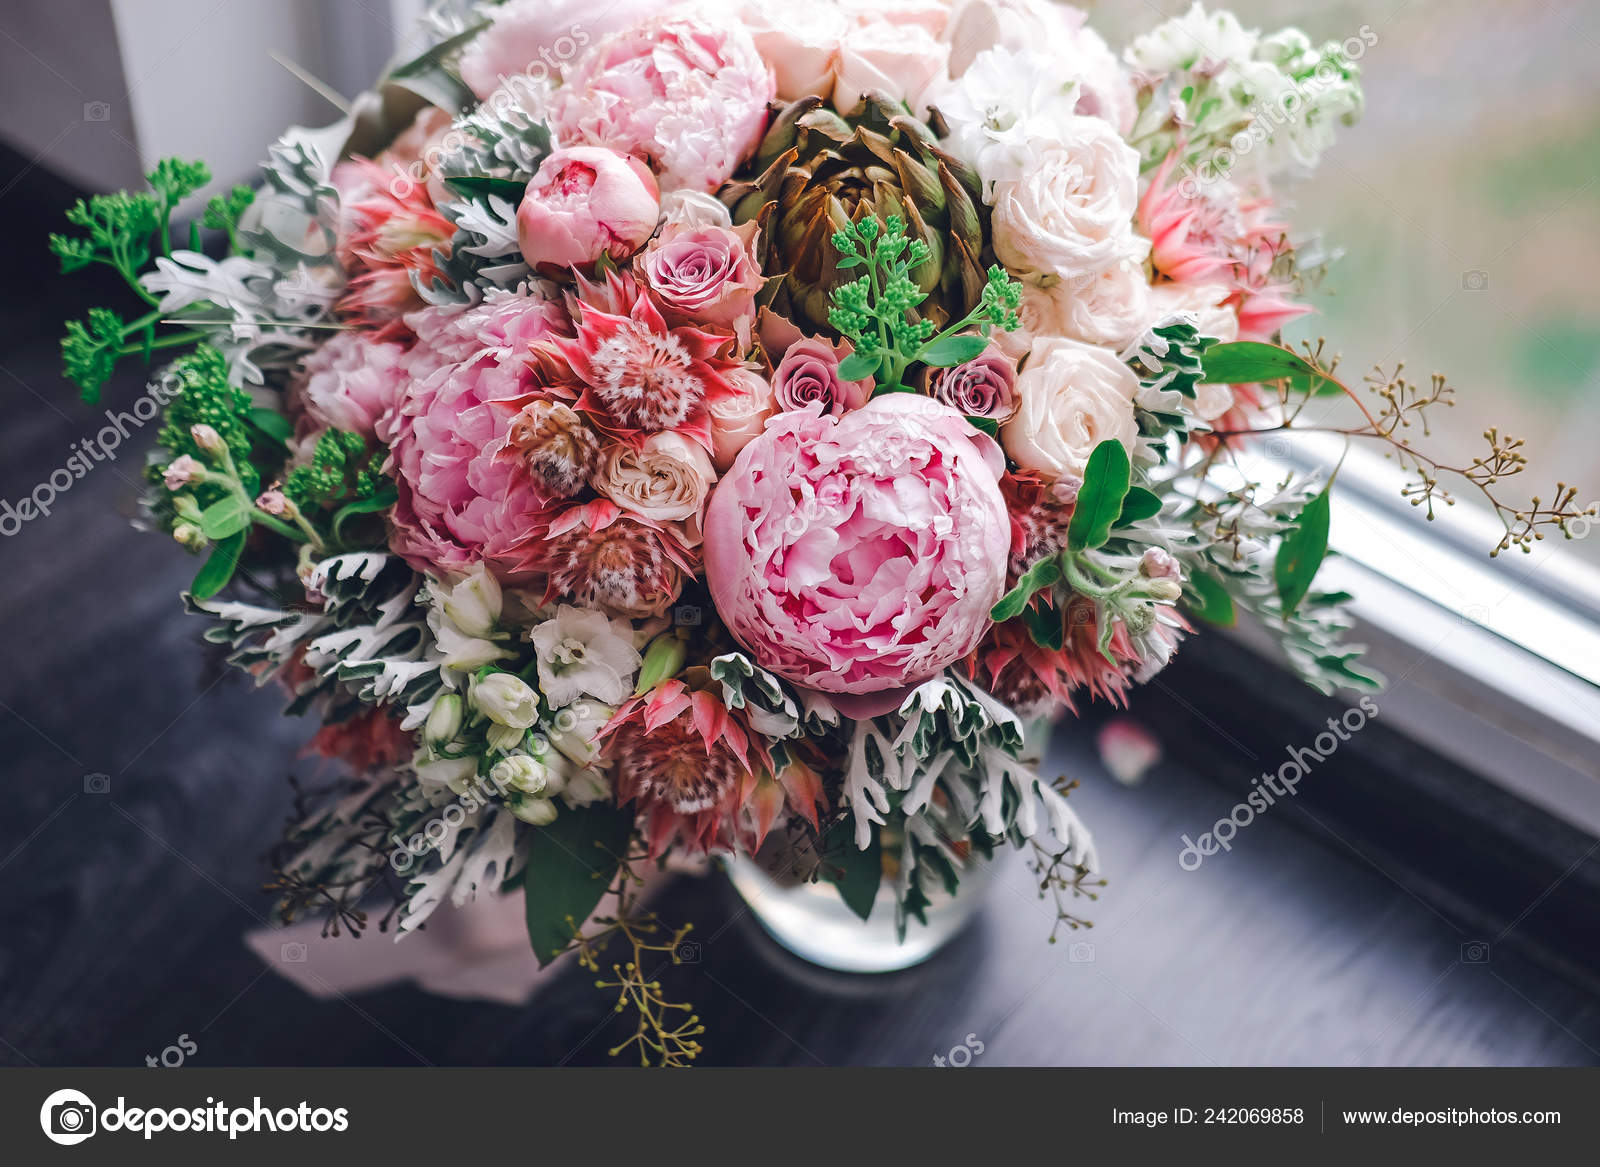 Big Beautiful Wedding Bouquet Spring Flowers Wooden Background Peonies Roses Stock Photo C Dashagrebenchuk Gmail Com 242069858